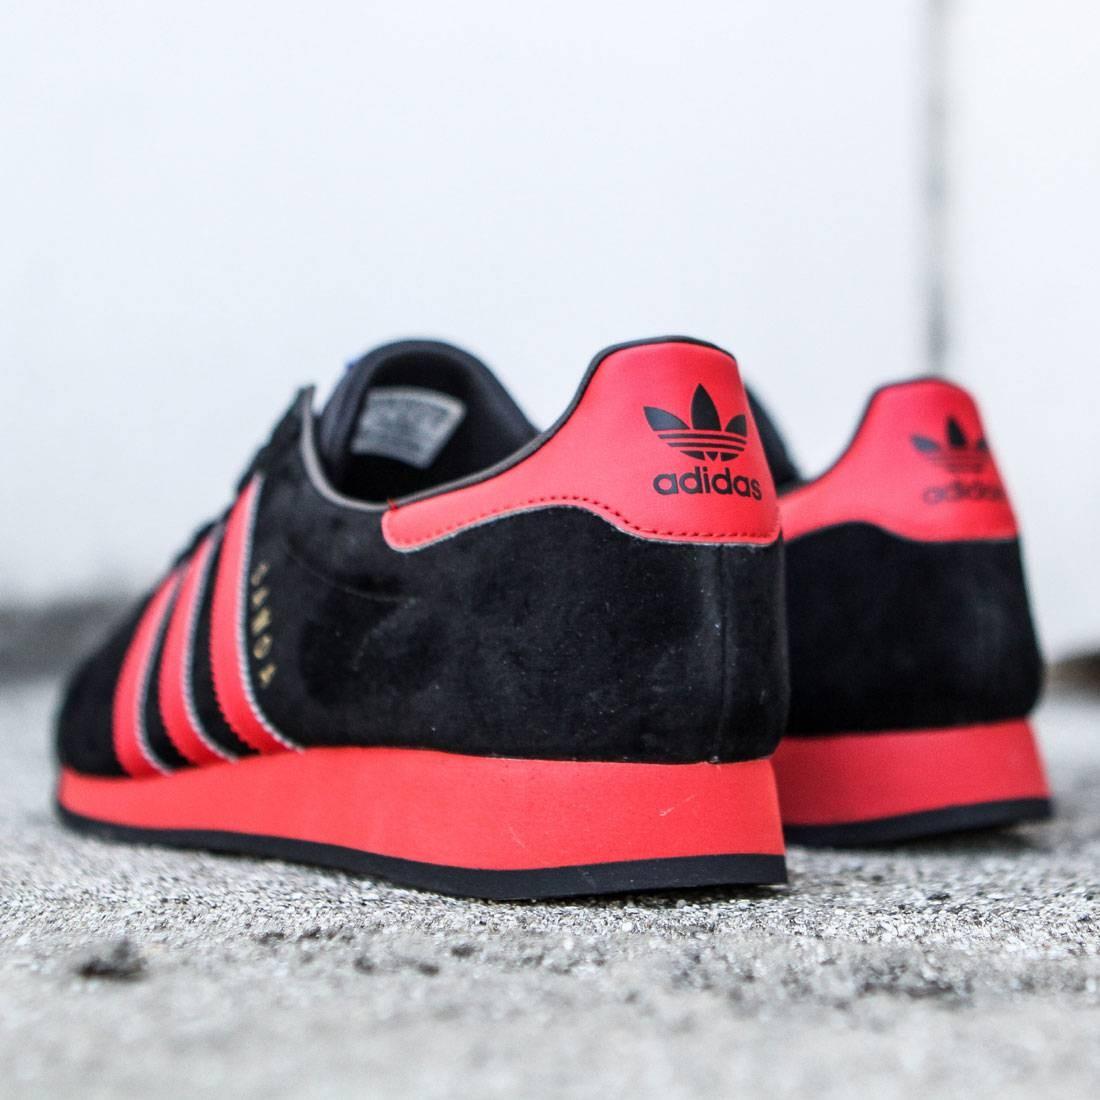 adidas samoa red and black